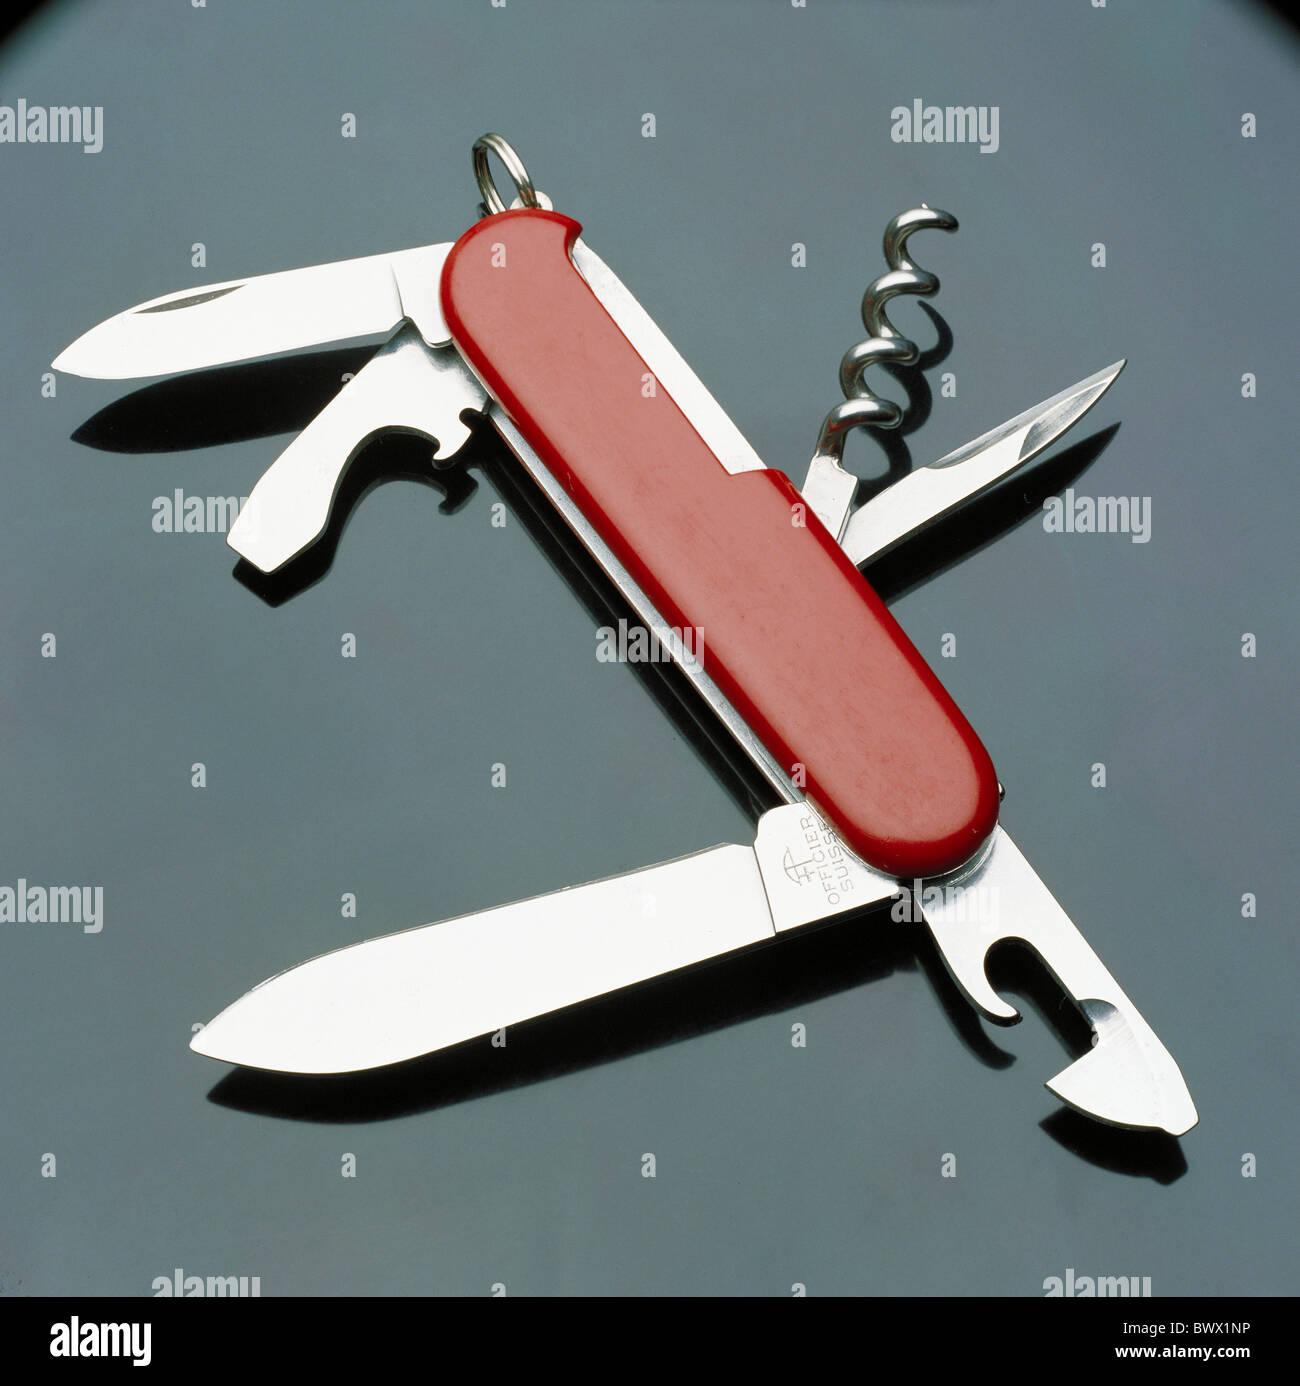 army knife appliance bag knife knife Switzerland Europe tools - Stock Image